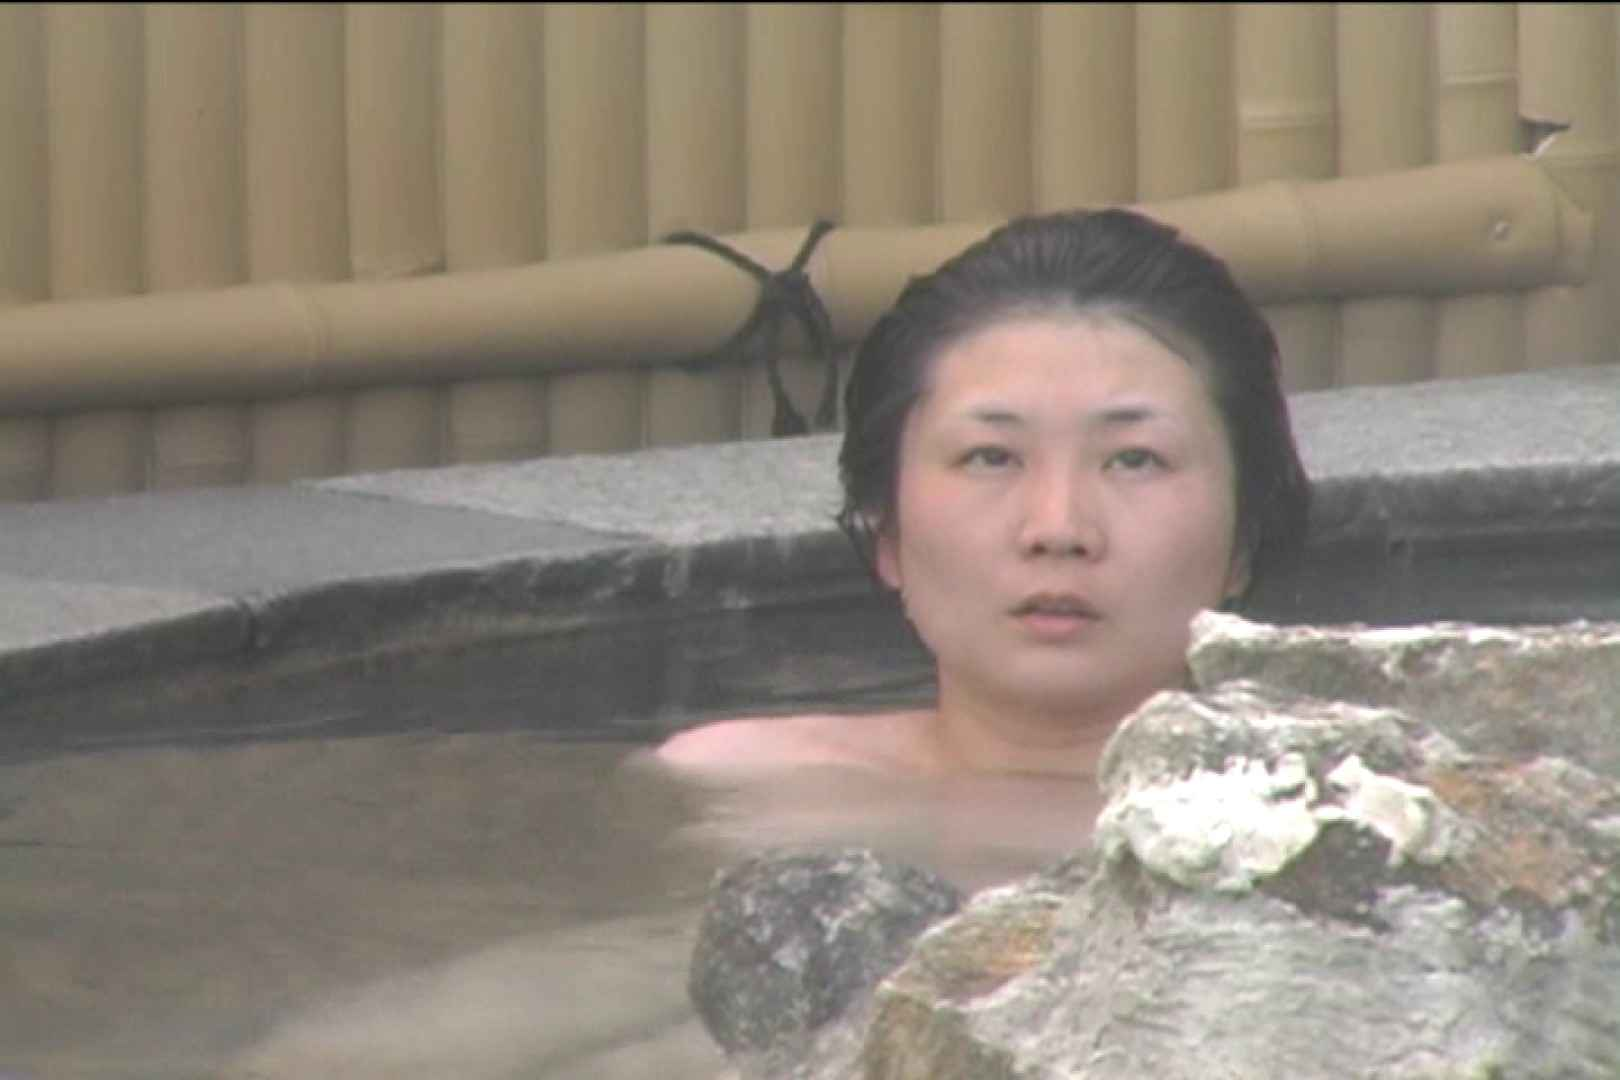 Aquaな露天風呂Vol.531 盗撮シリーズ | 露天風呂編  85PIX 53